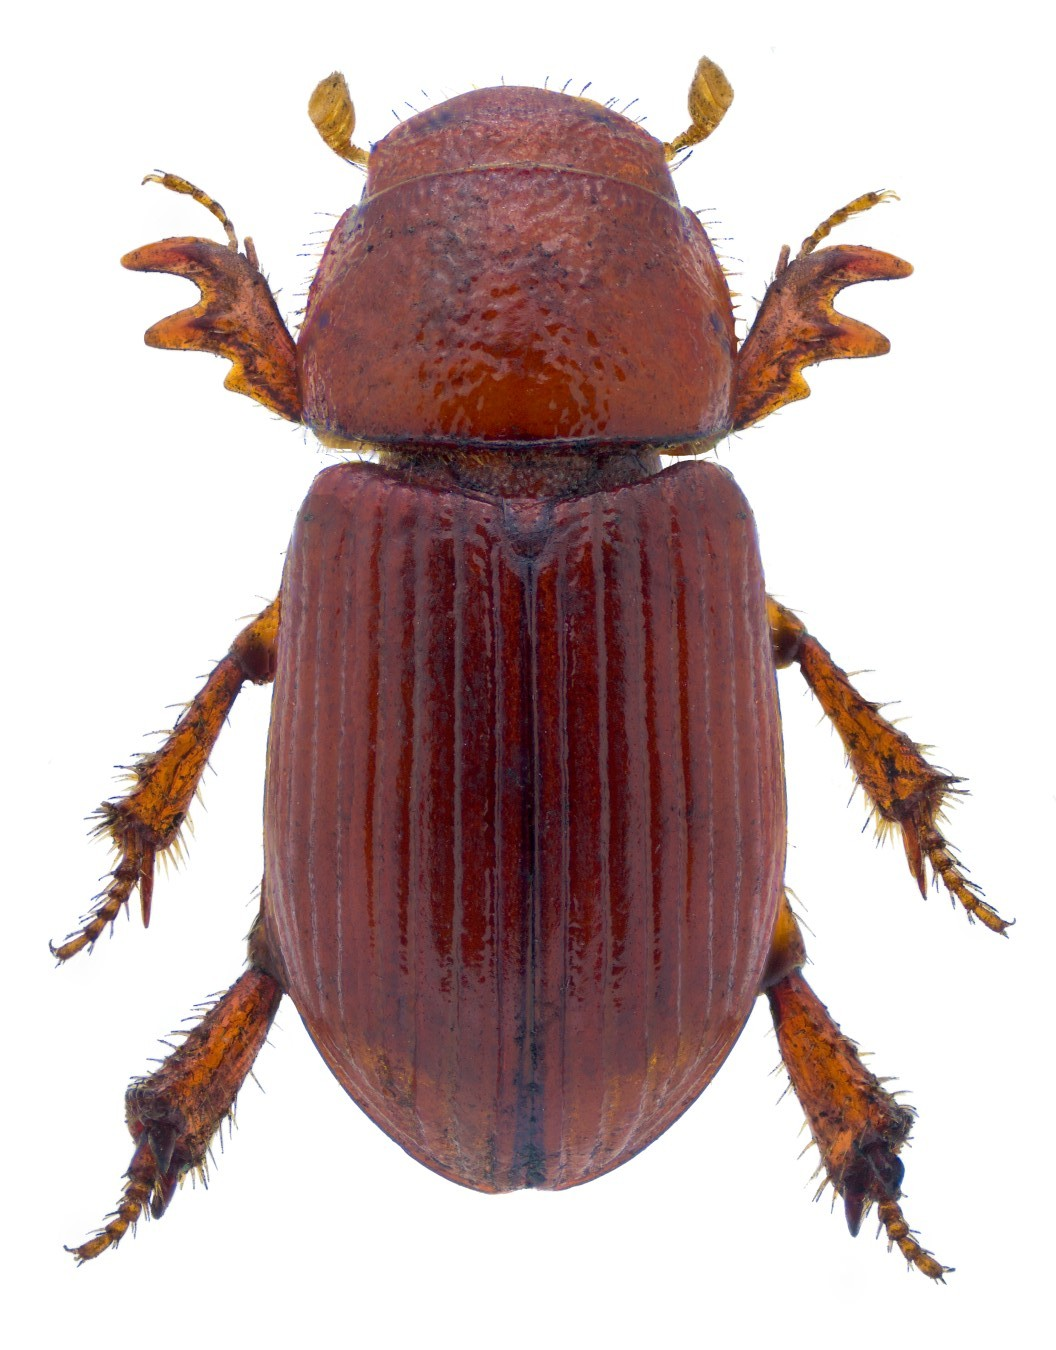 Rhysothorax rufa